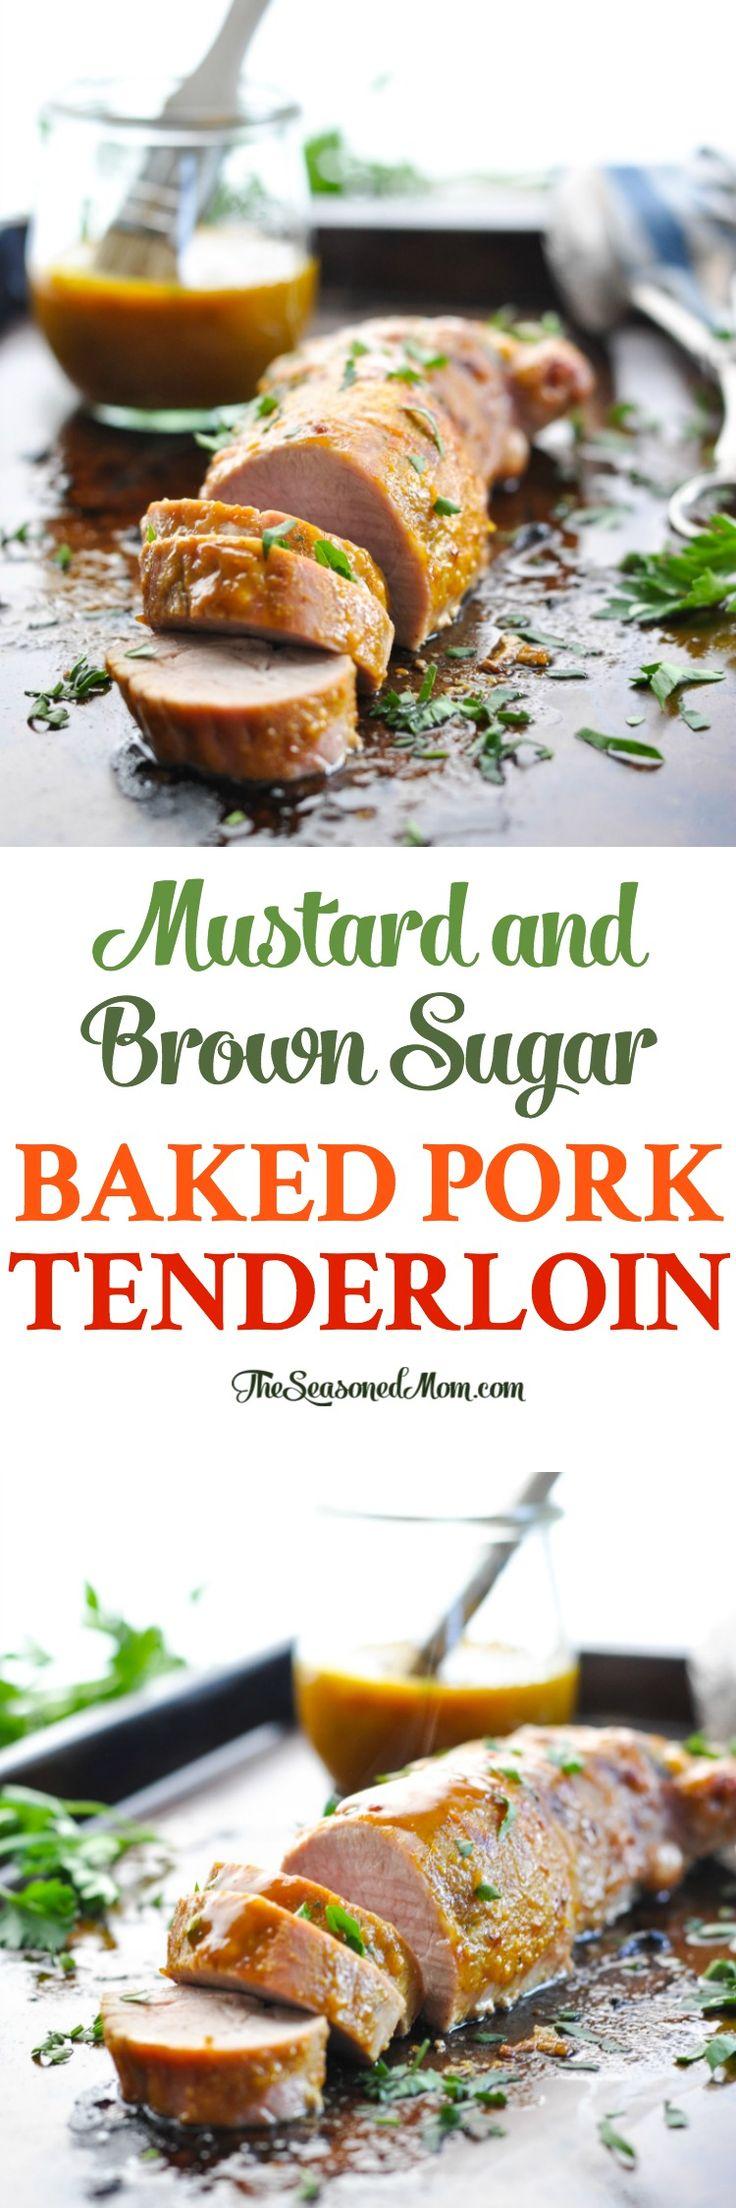 Mustard and Brown Sugar Baked Pork Tenderloin